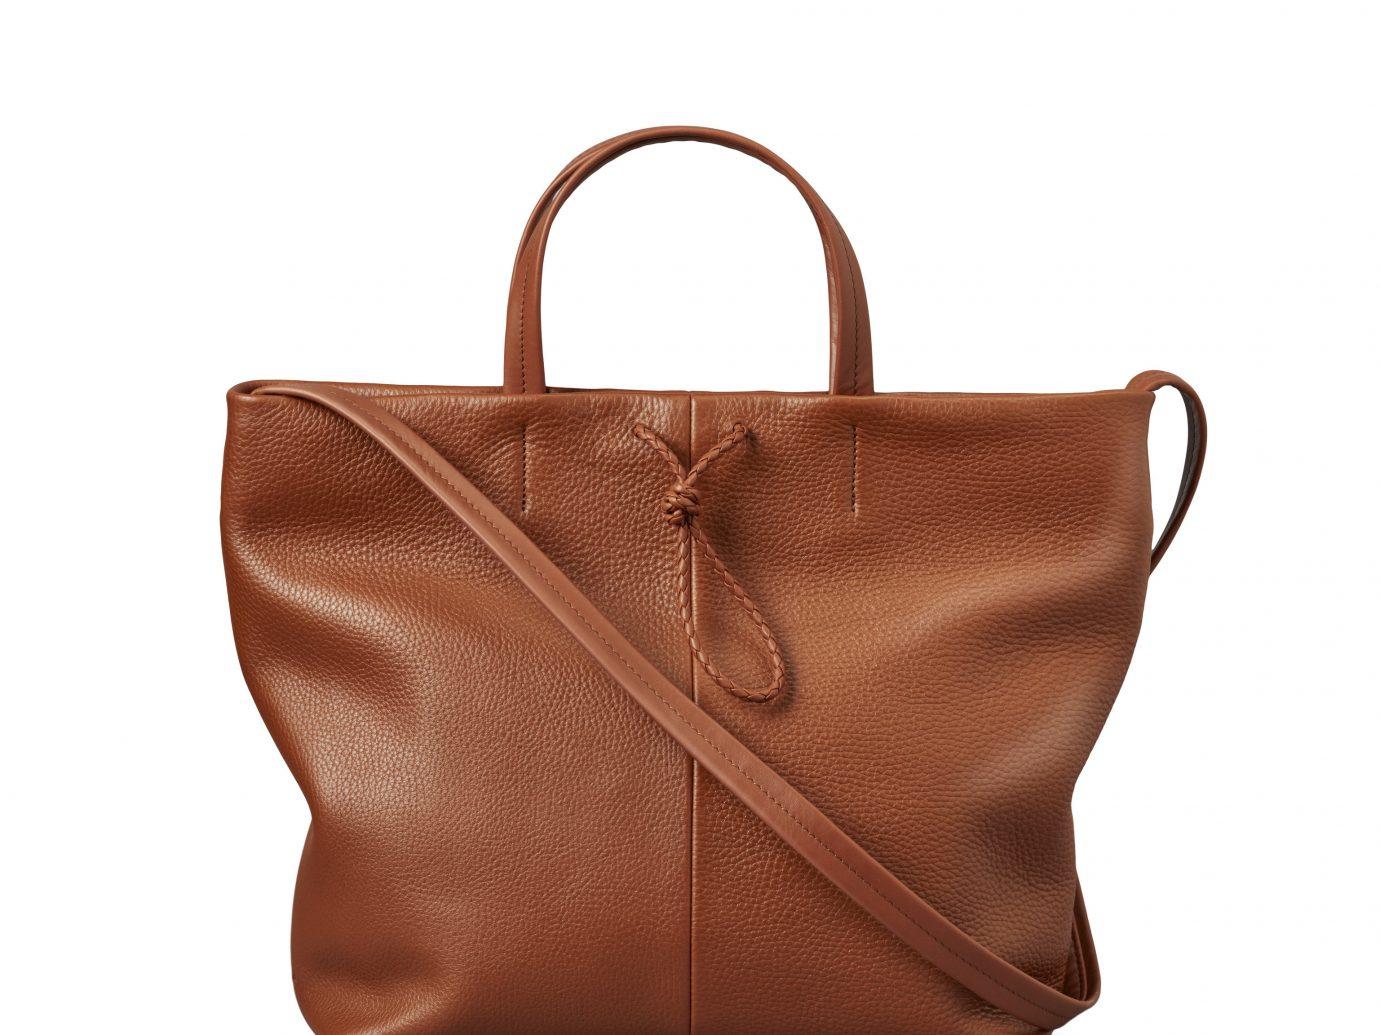 Arts + Culture Boutique Hotels City Jetsetter Guides handbag bag brown accessory leather shoulder bag fashion accessory caramel color product tote bag product design peach beige brand case